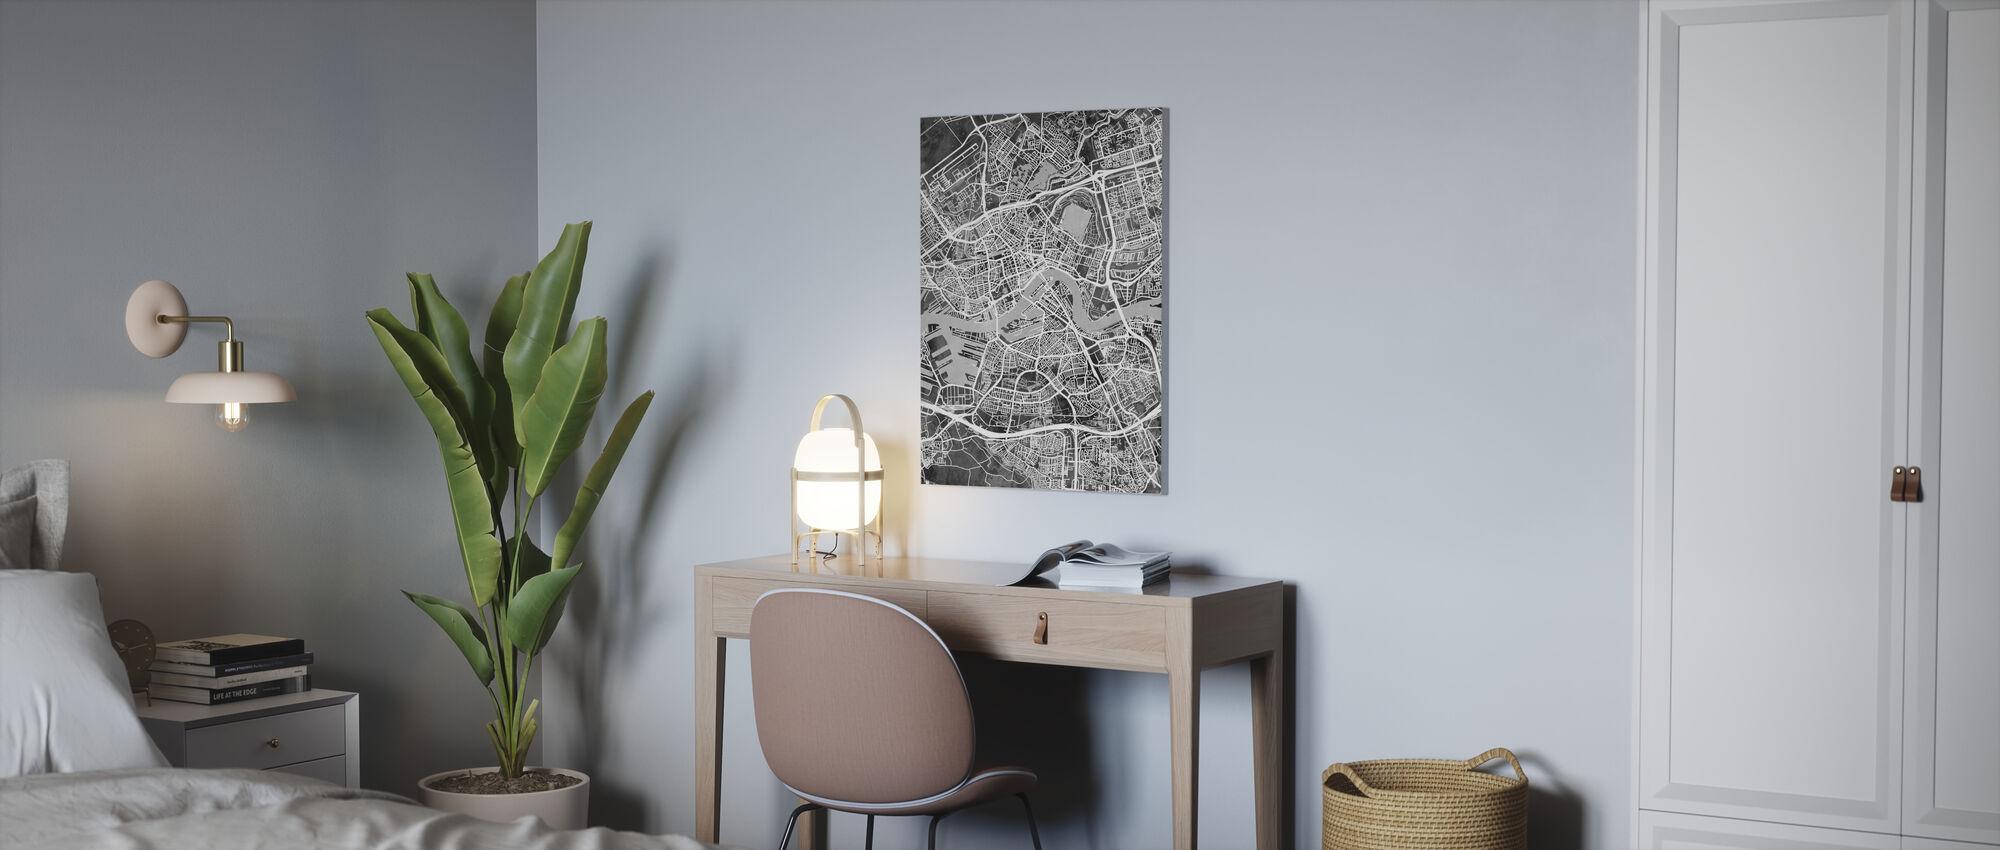 Rotterdam Niederlande Stadtplan - Leinwandbild - Büro